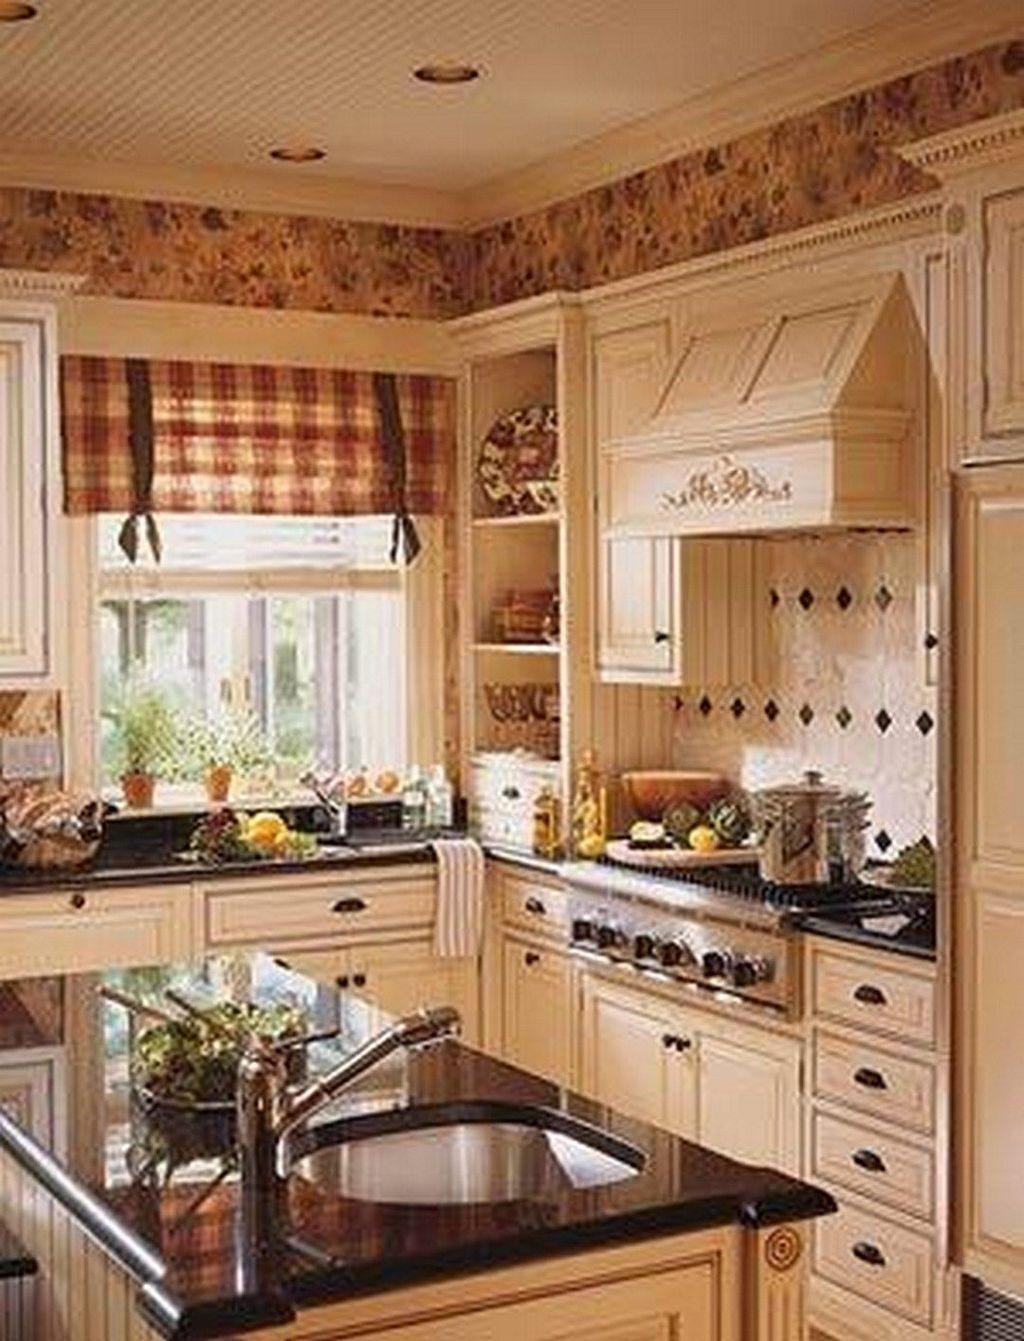 Pin By Kukun Remodeling Ideas On Kitchen Ideas Country Kitchen Designs French Country Kitchens Country Kitchen